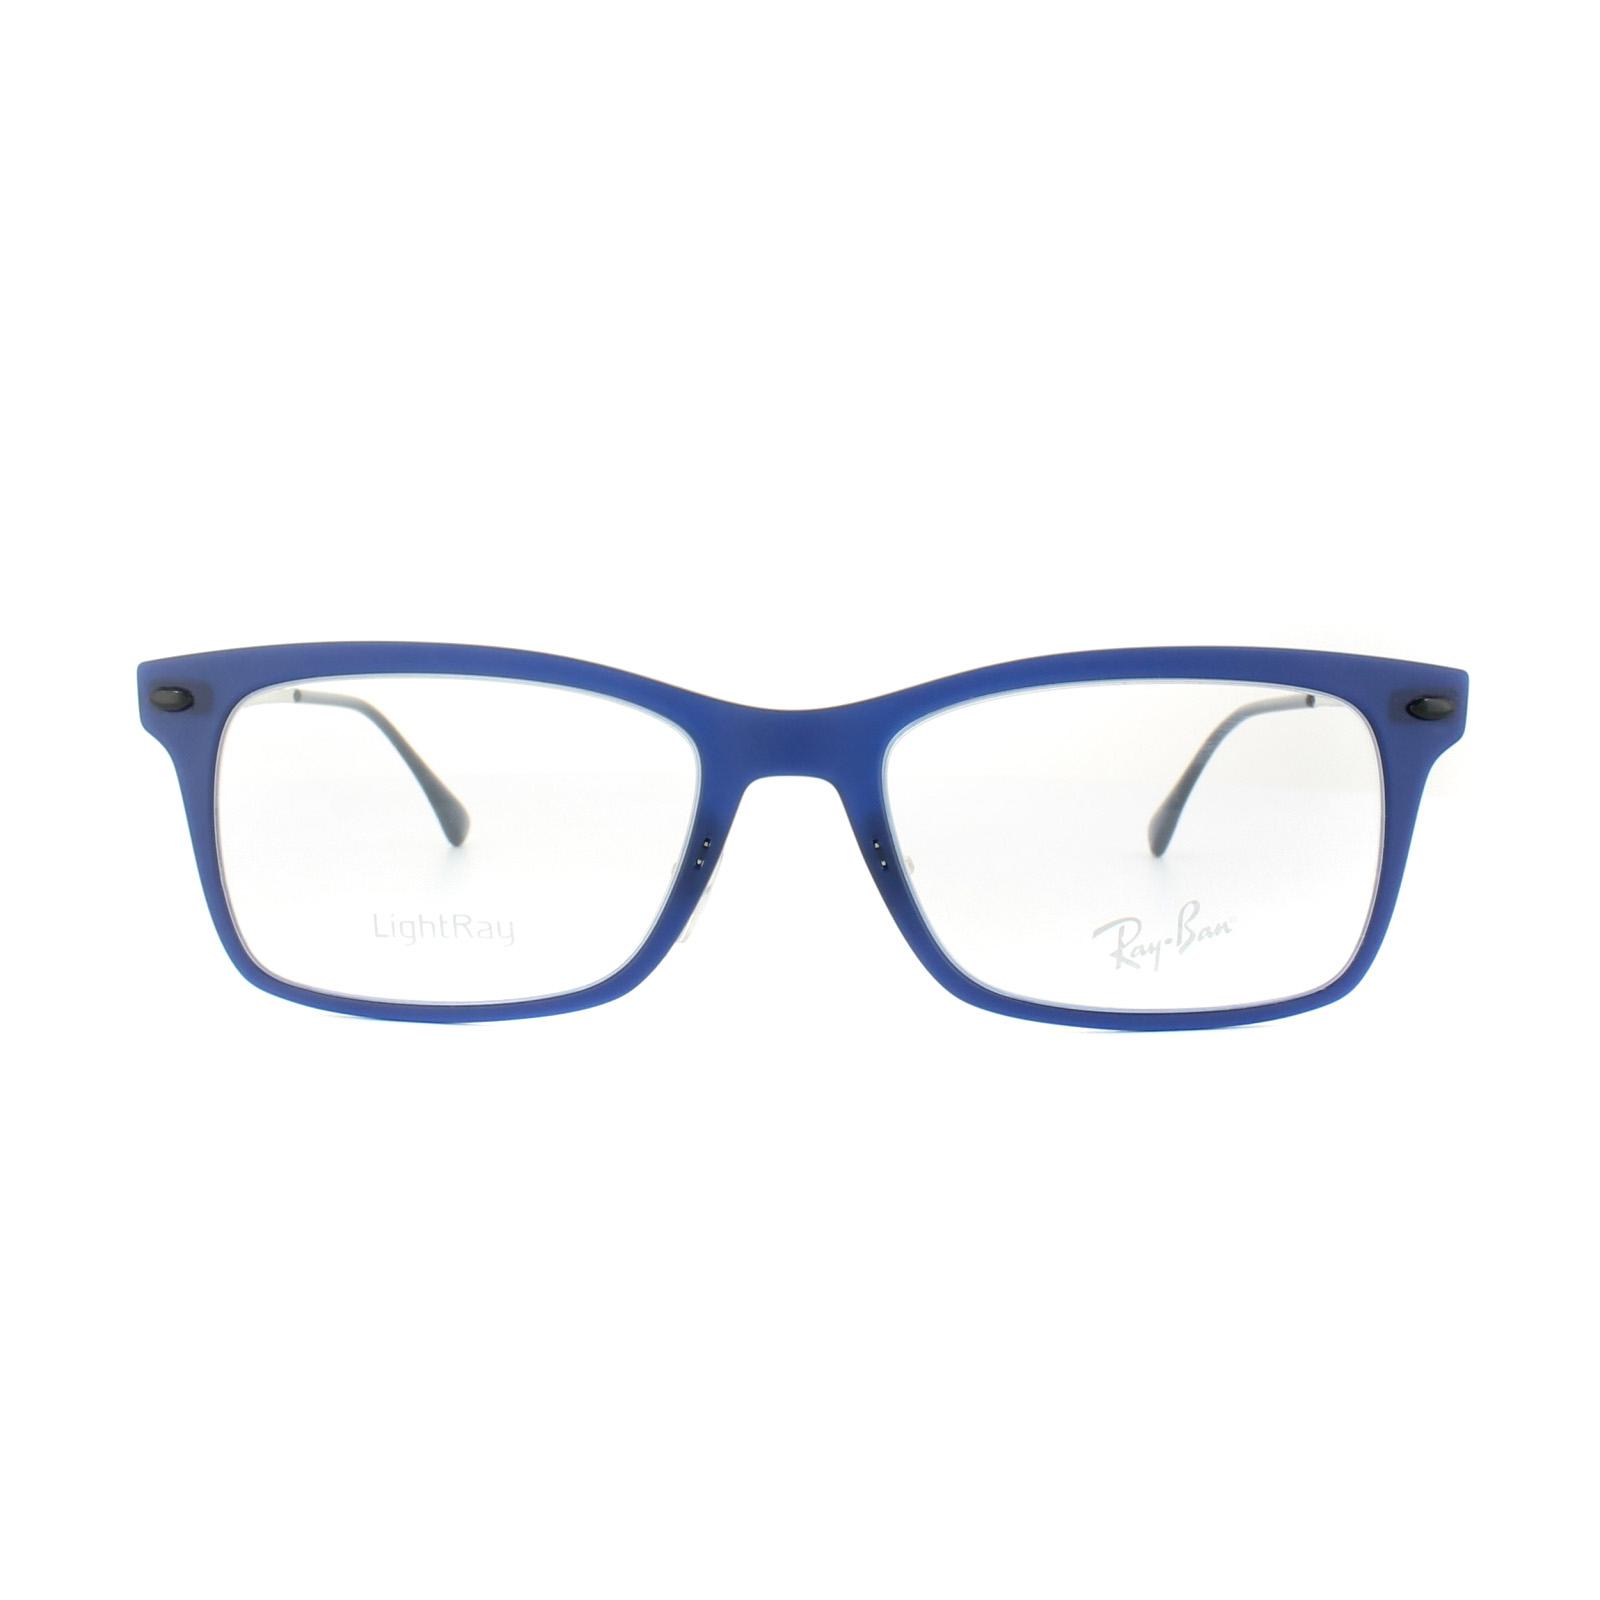 3c82bf36904 Sentinel Ray-Ban Glasses Frames RX 7039 5451 Dark Matt Blue Mens Womens 53mm